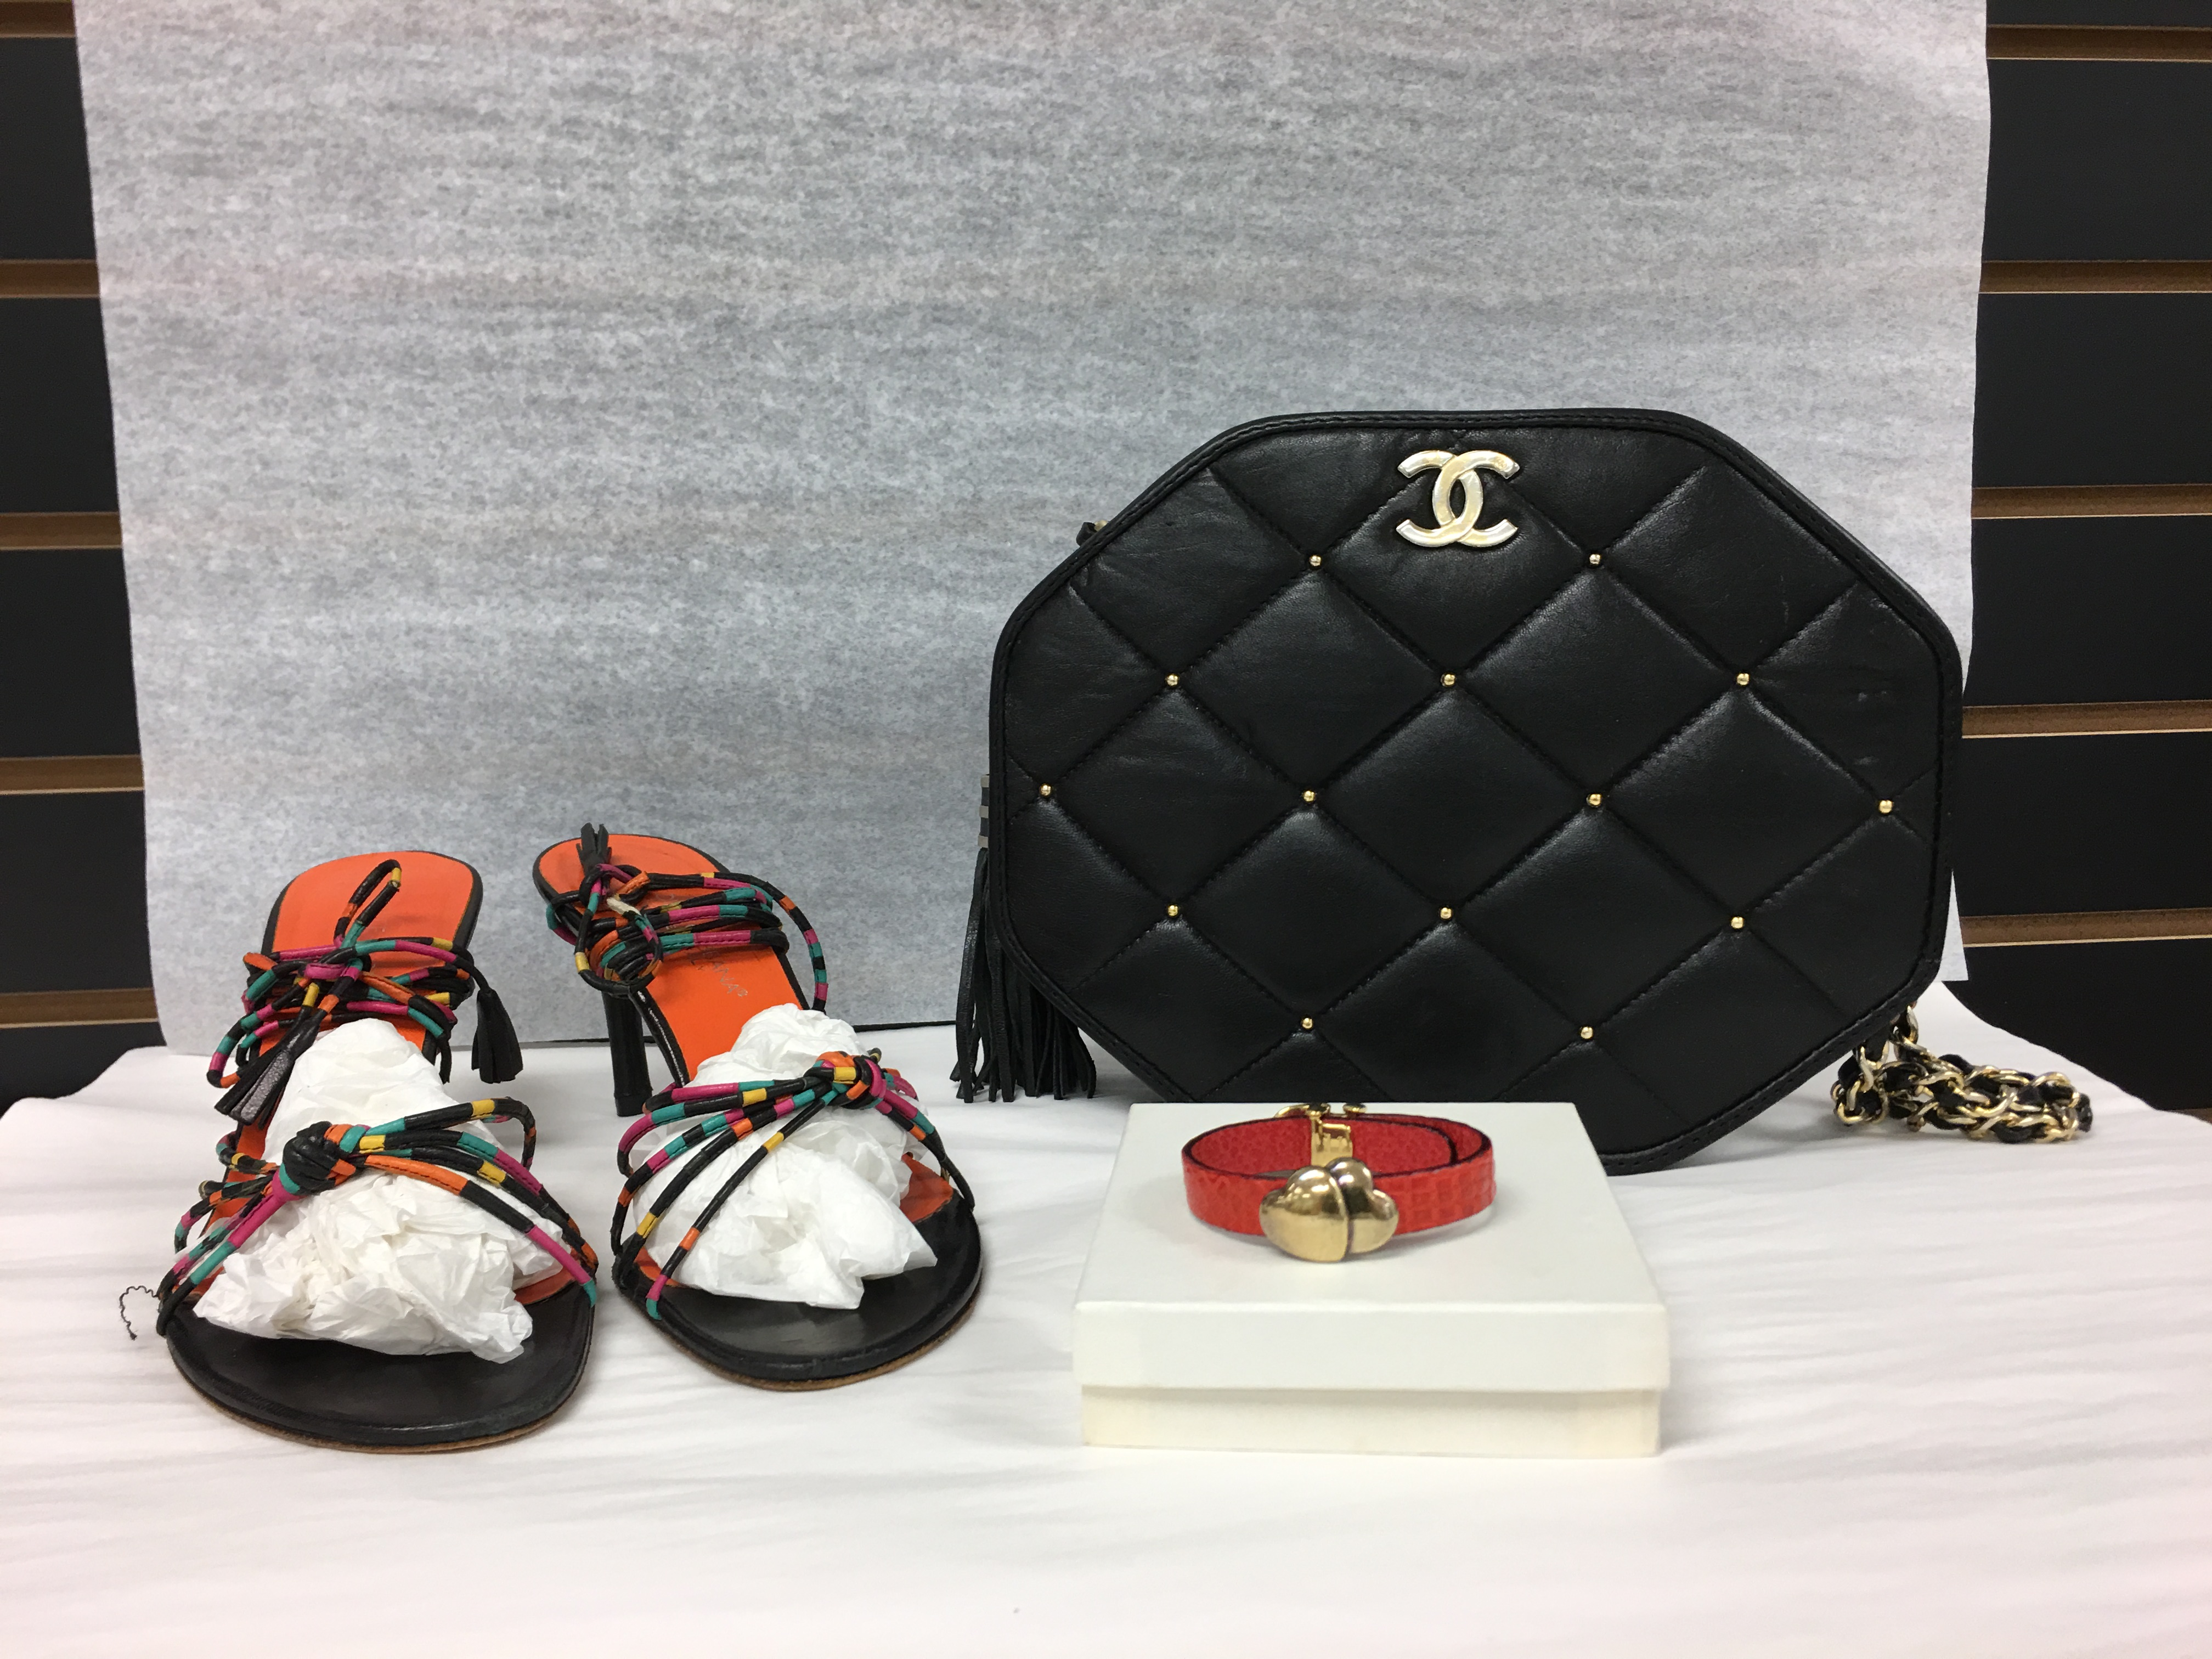 Leather Zone Sparta Nj Shoe Repair And Handbag Services